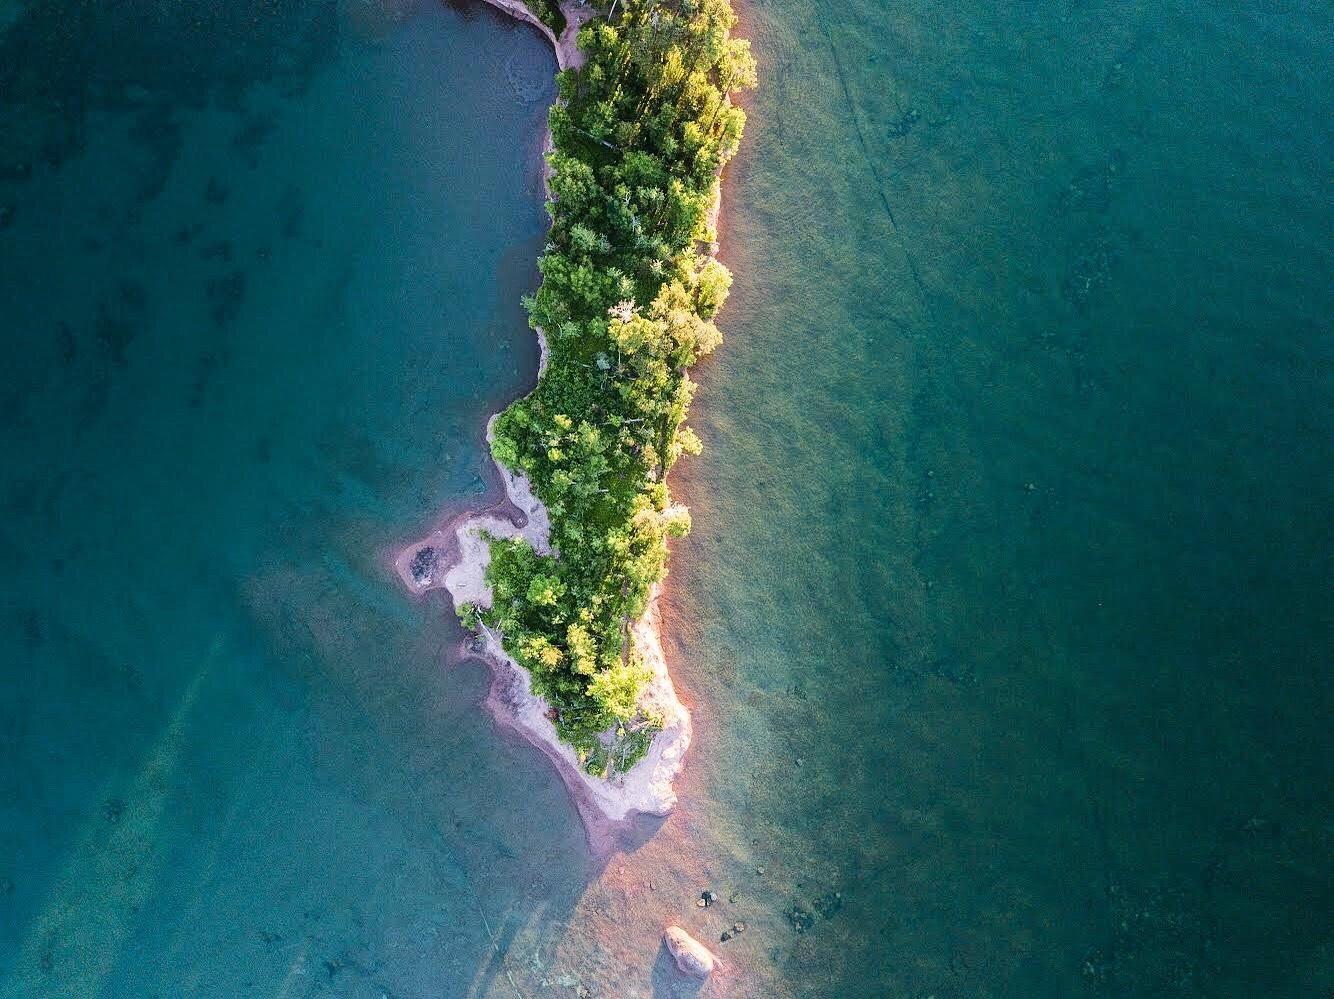 Island by John Berry